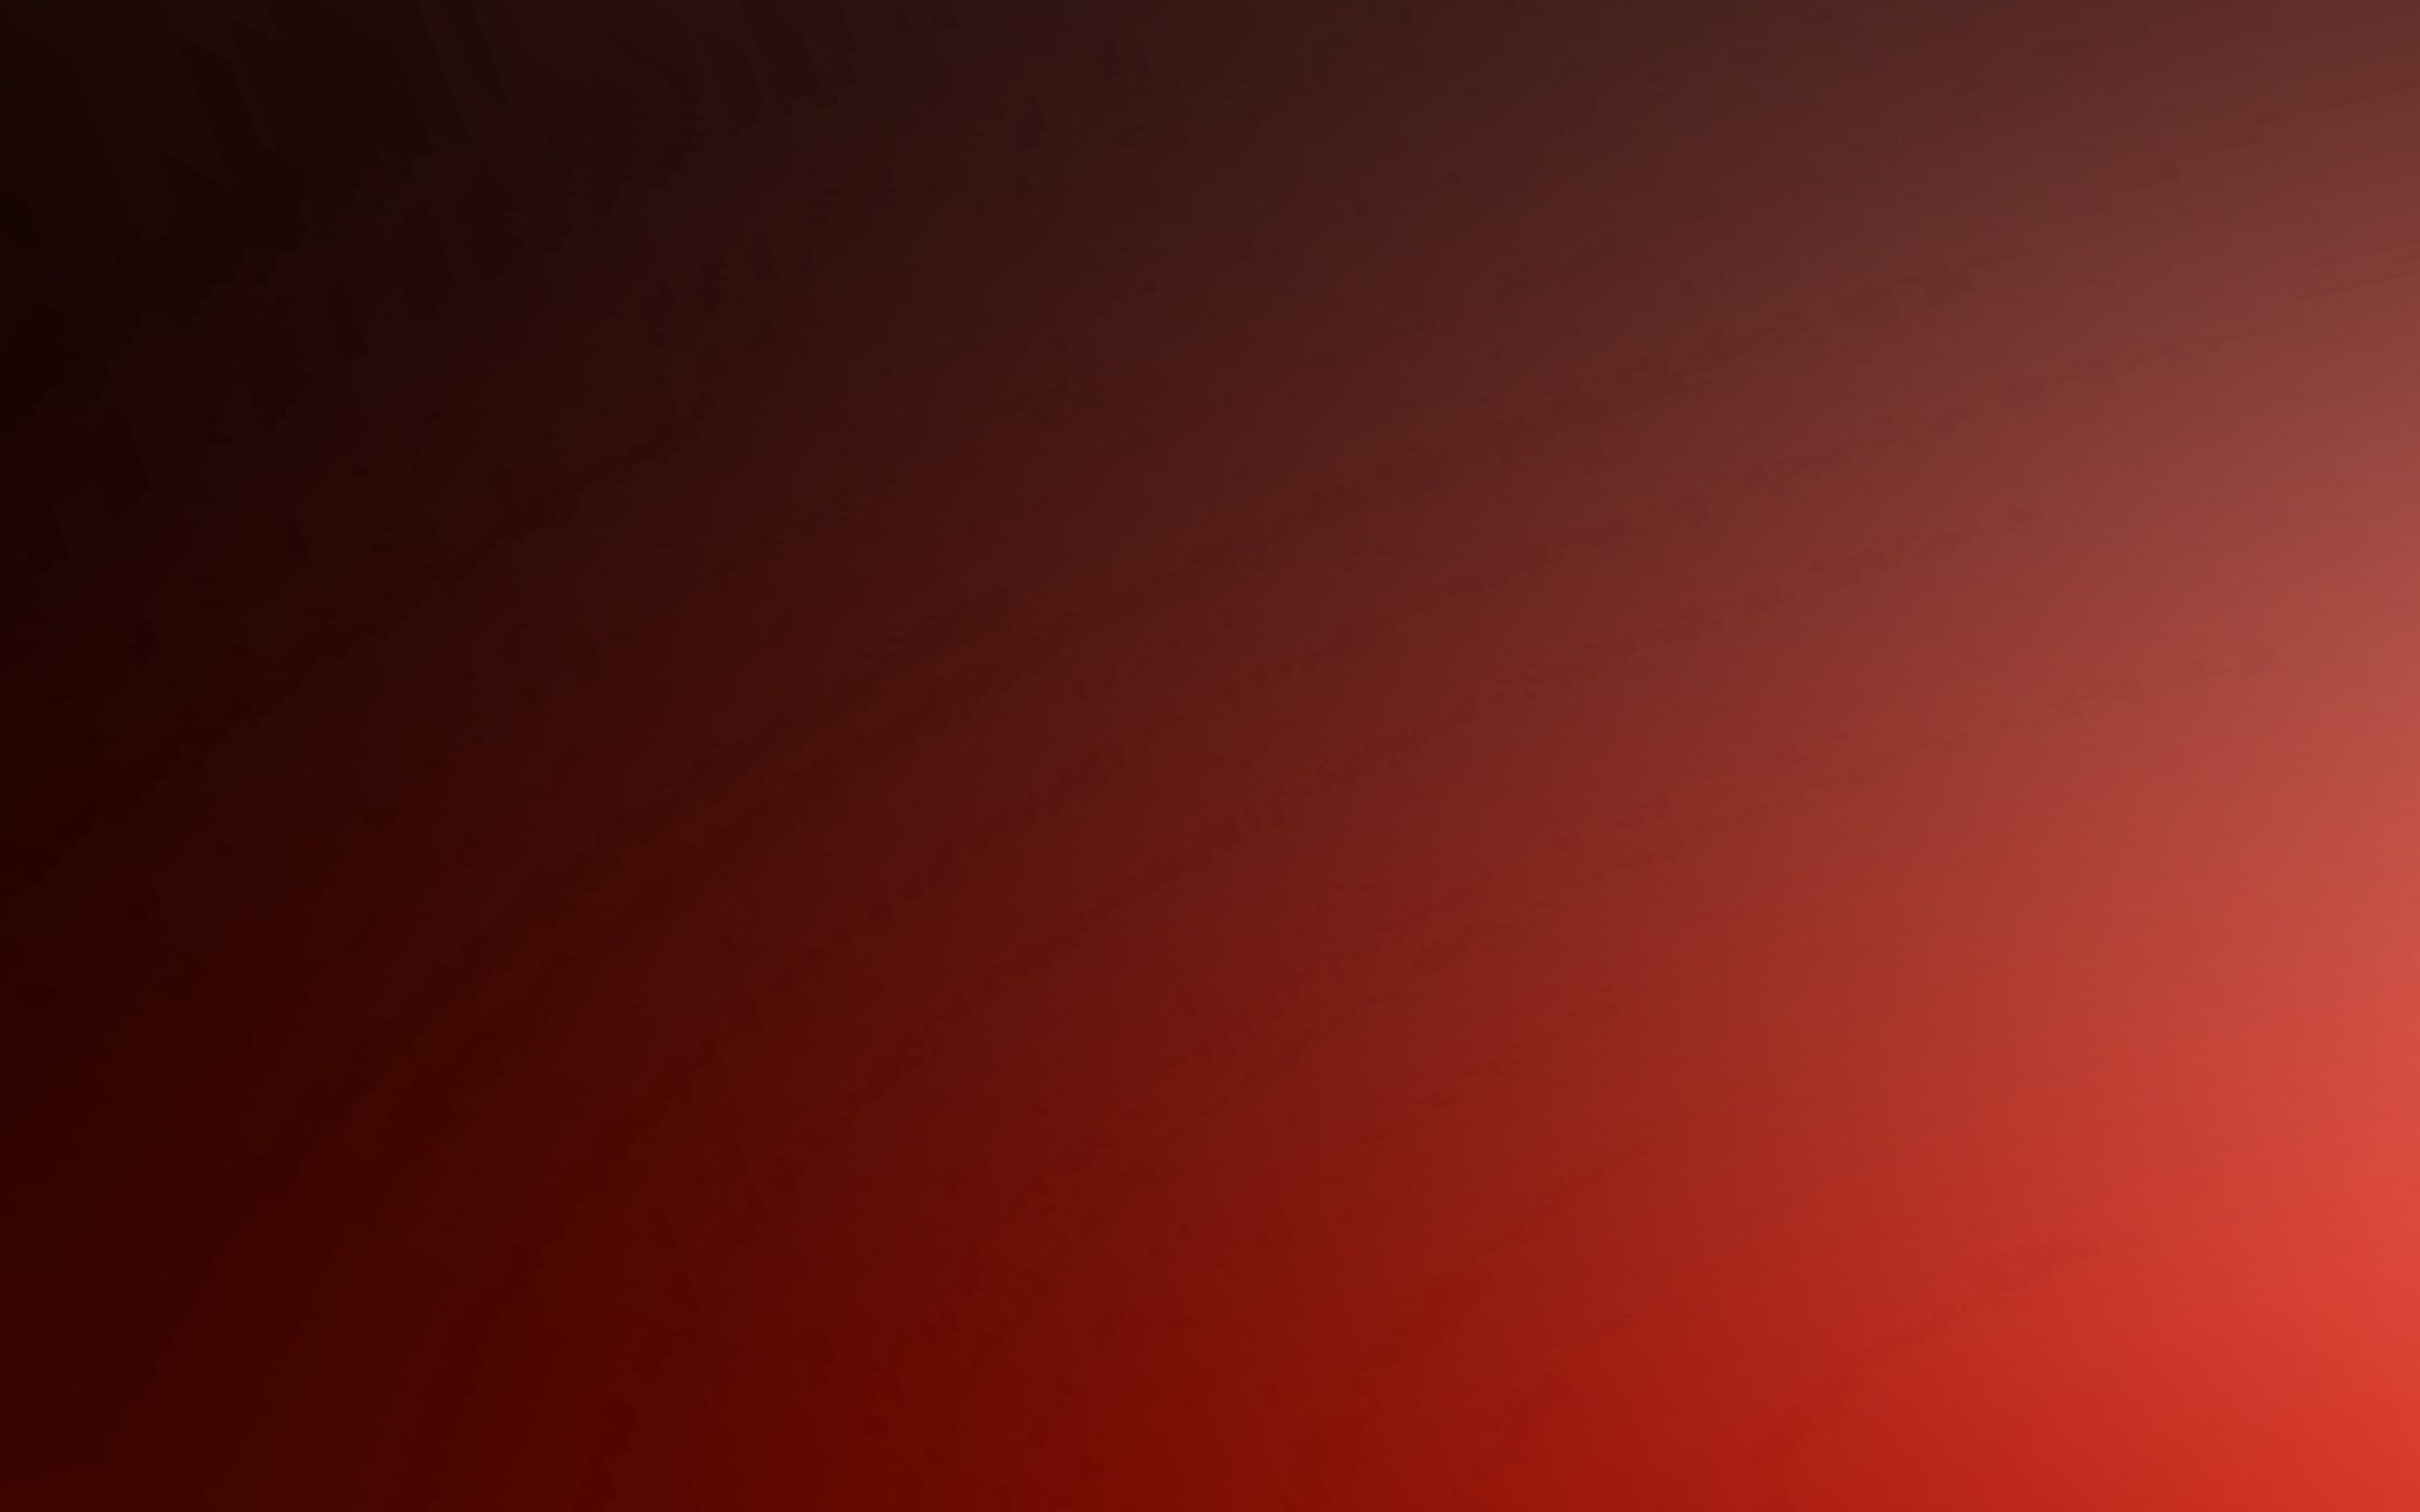 113938 descarga Rojo fondos de pantalla para tu teléfono gratis, Abstracción, Desteñido, Descolorido, Fondo, Sombra Rojo imágenes y protectores de pantalla para tu teléfono